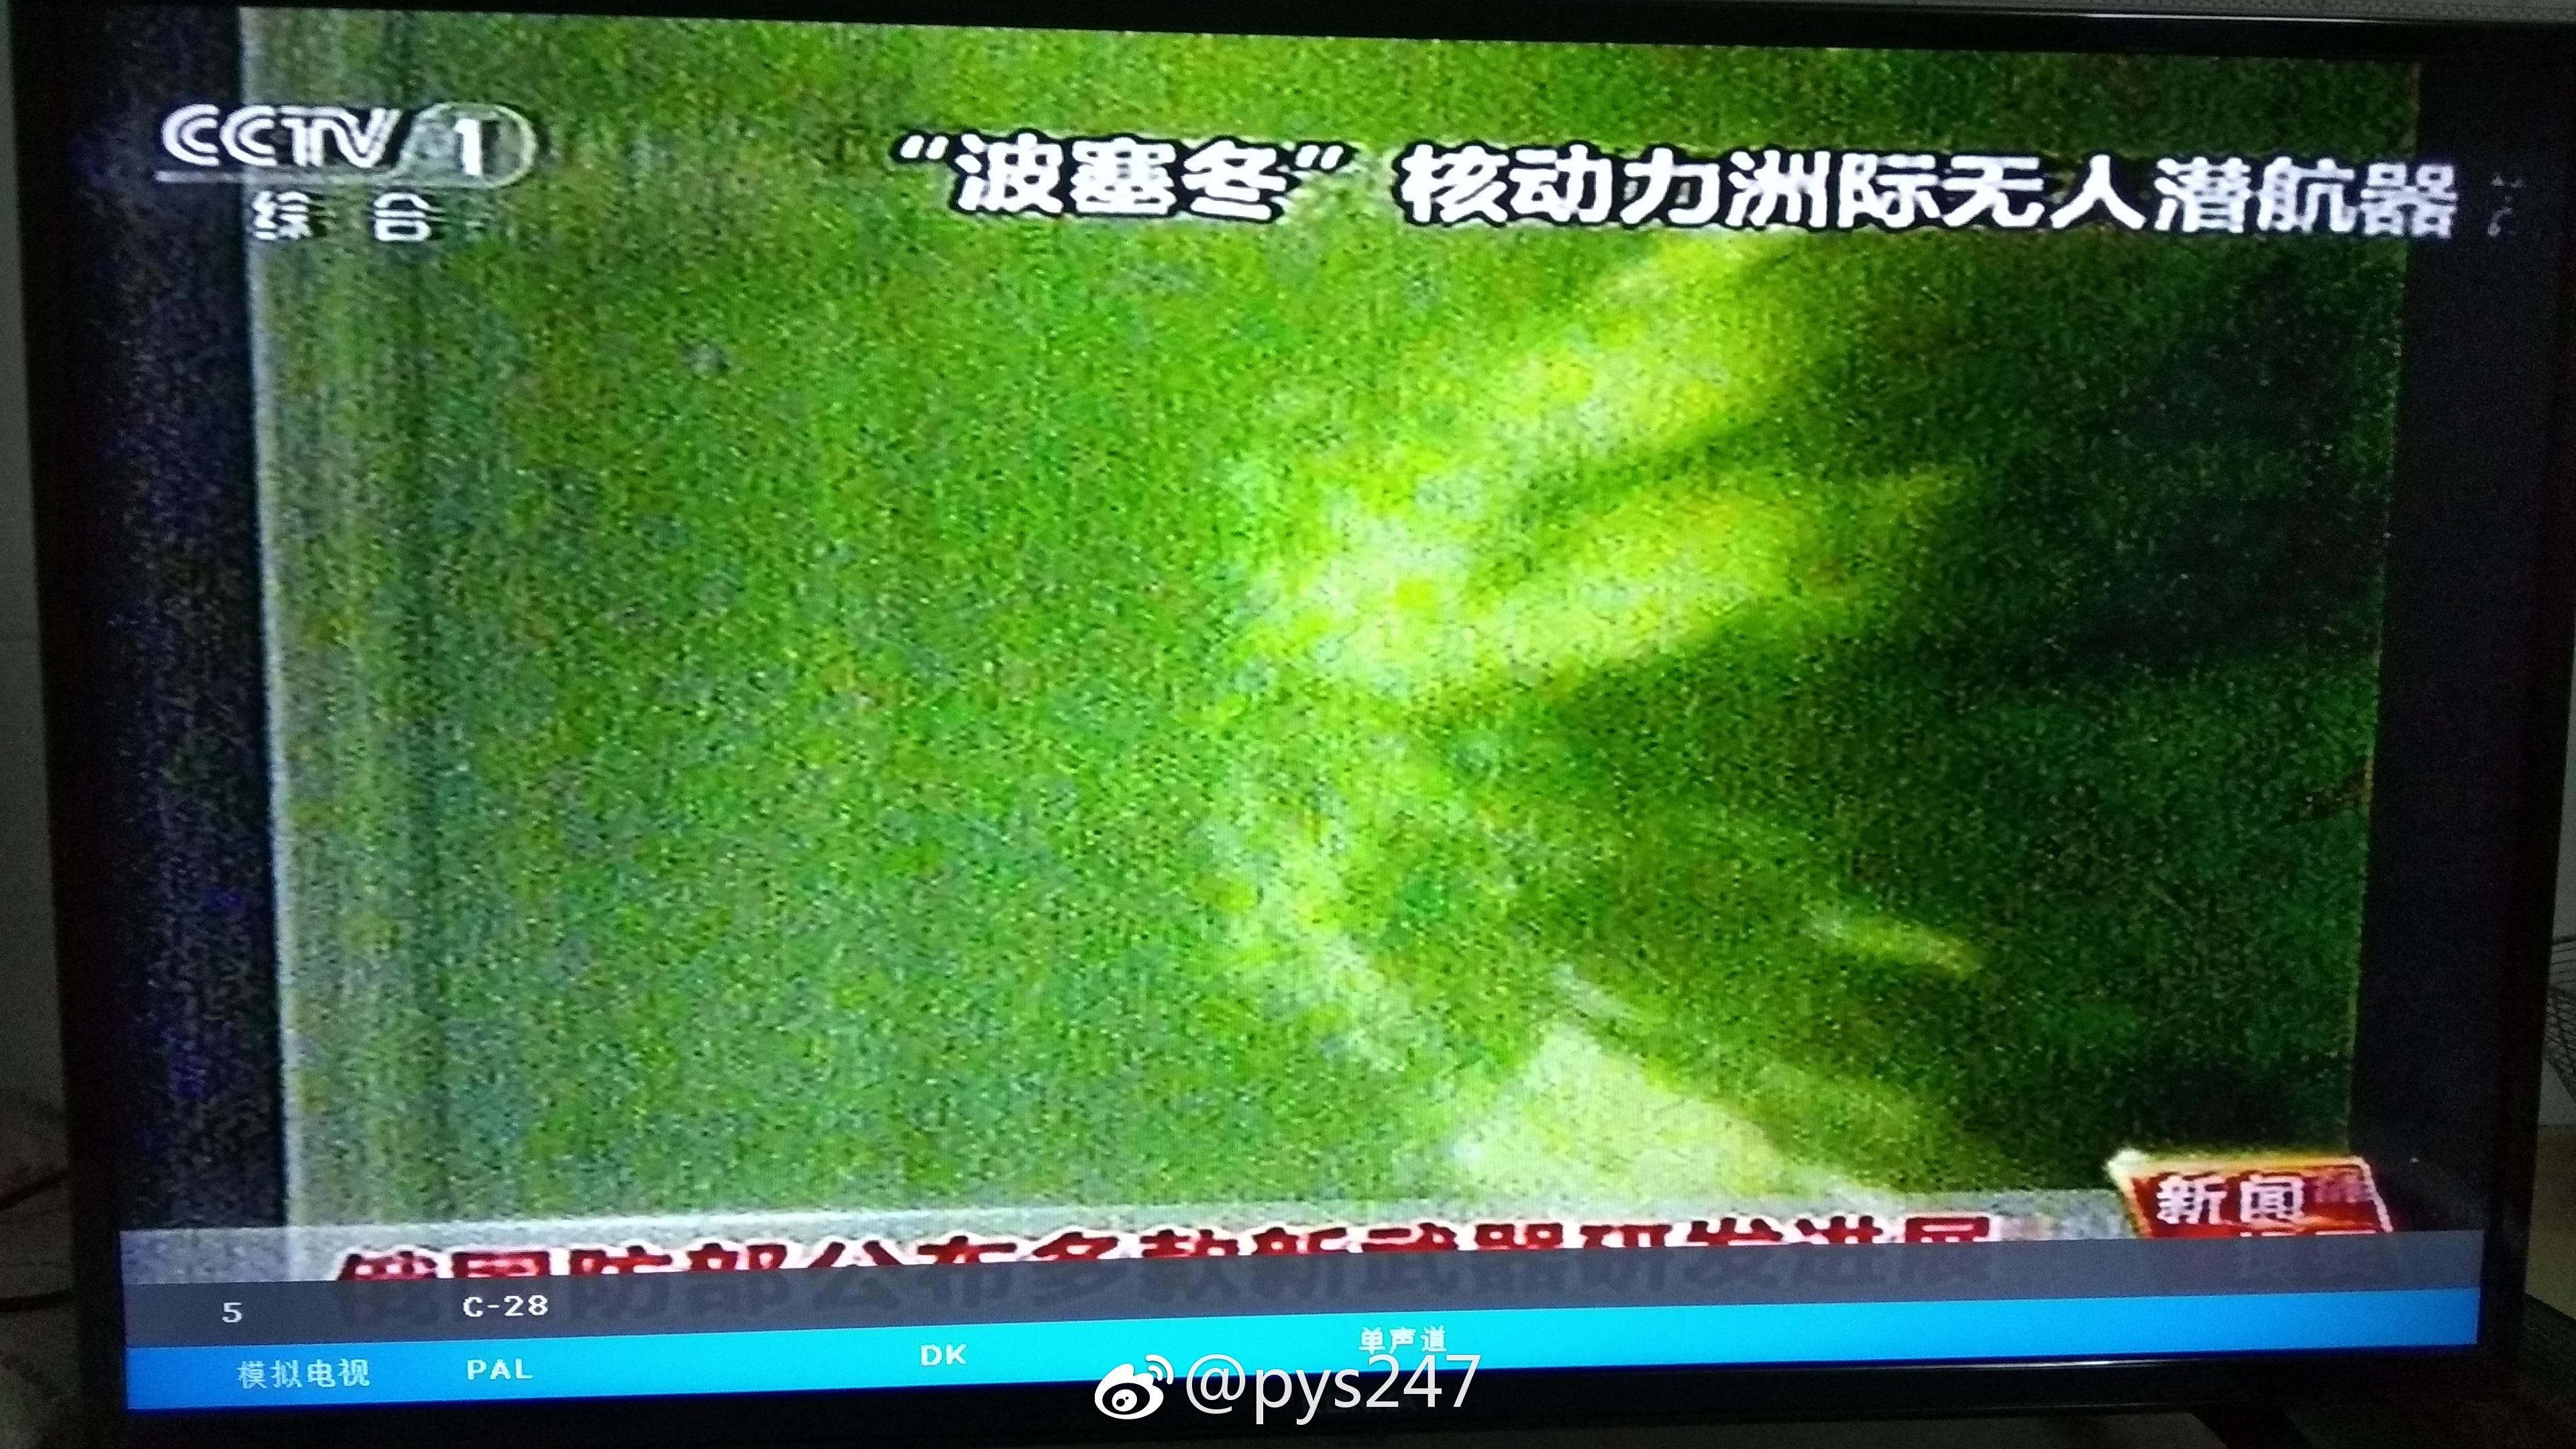 DS-20 CCTV-1